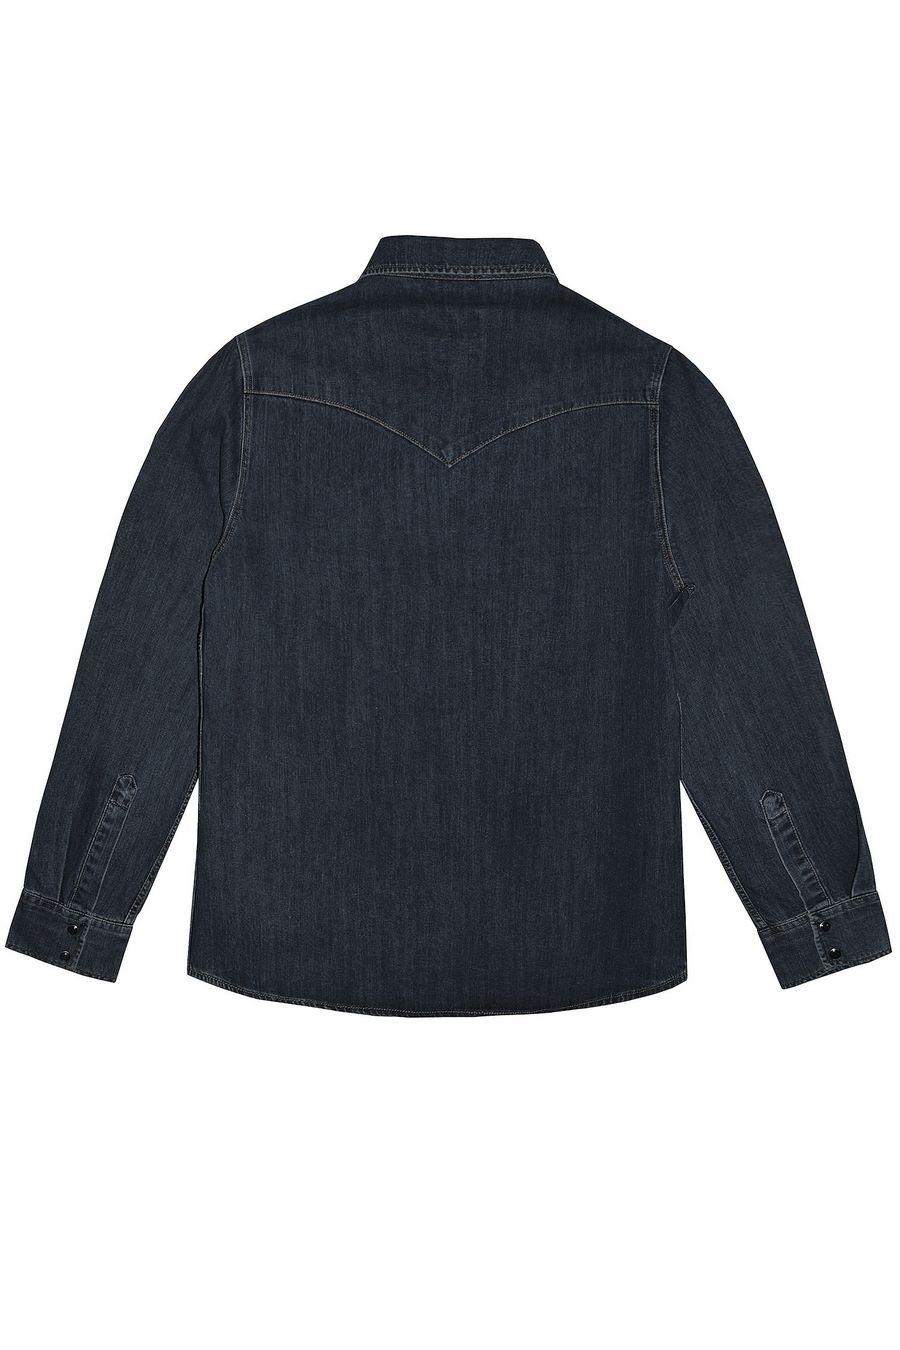 Рубашка мужская Koutons 1997 Talin Black 02 - фото 2